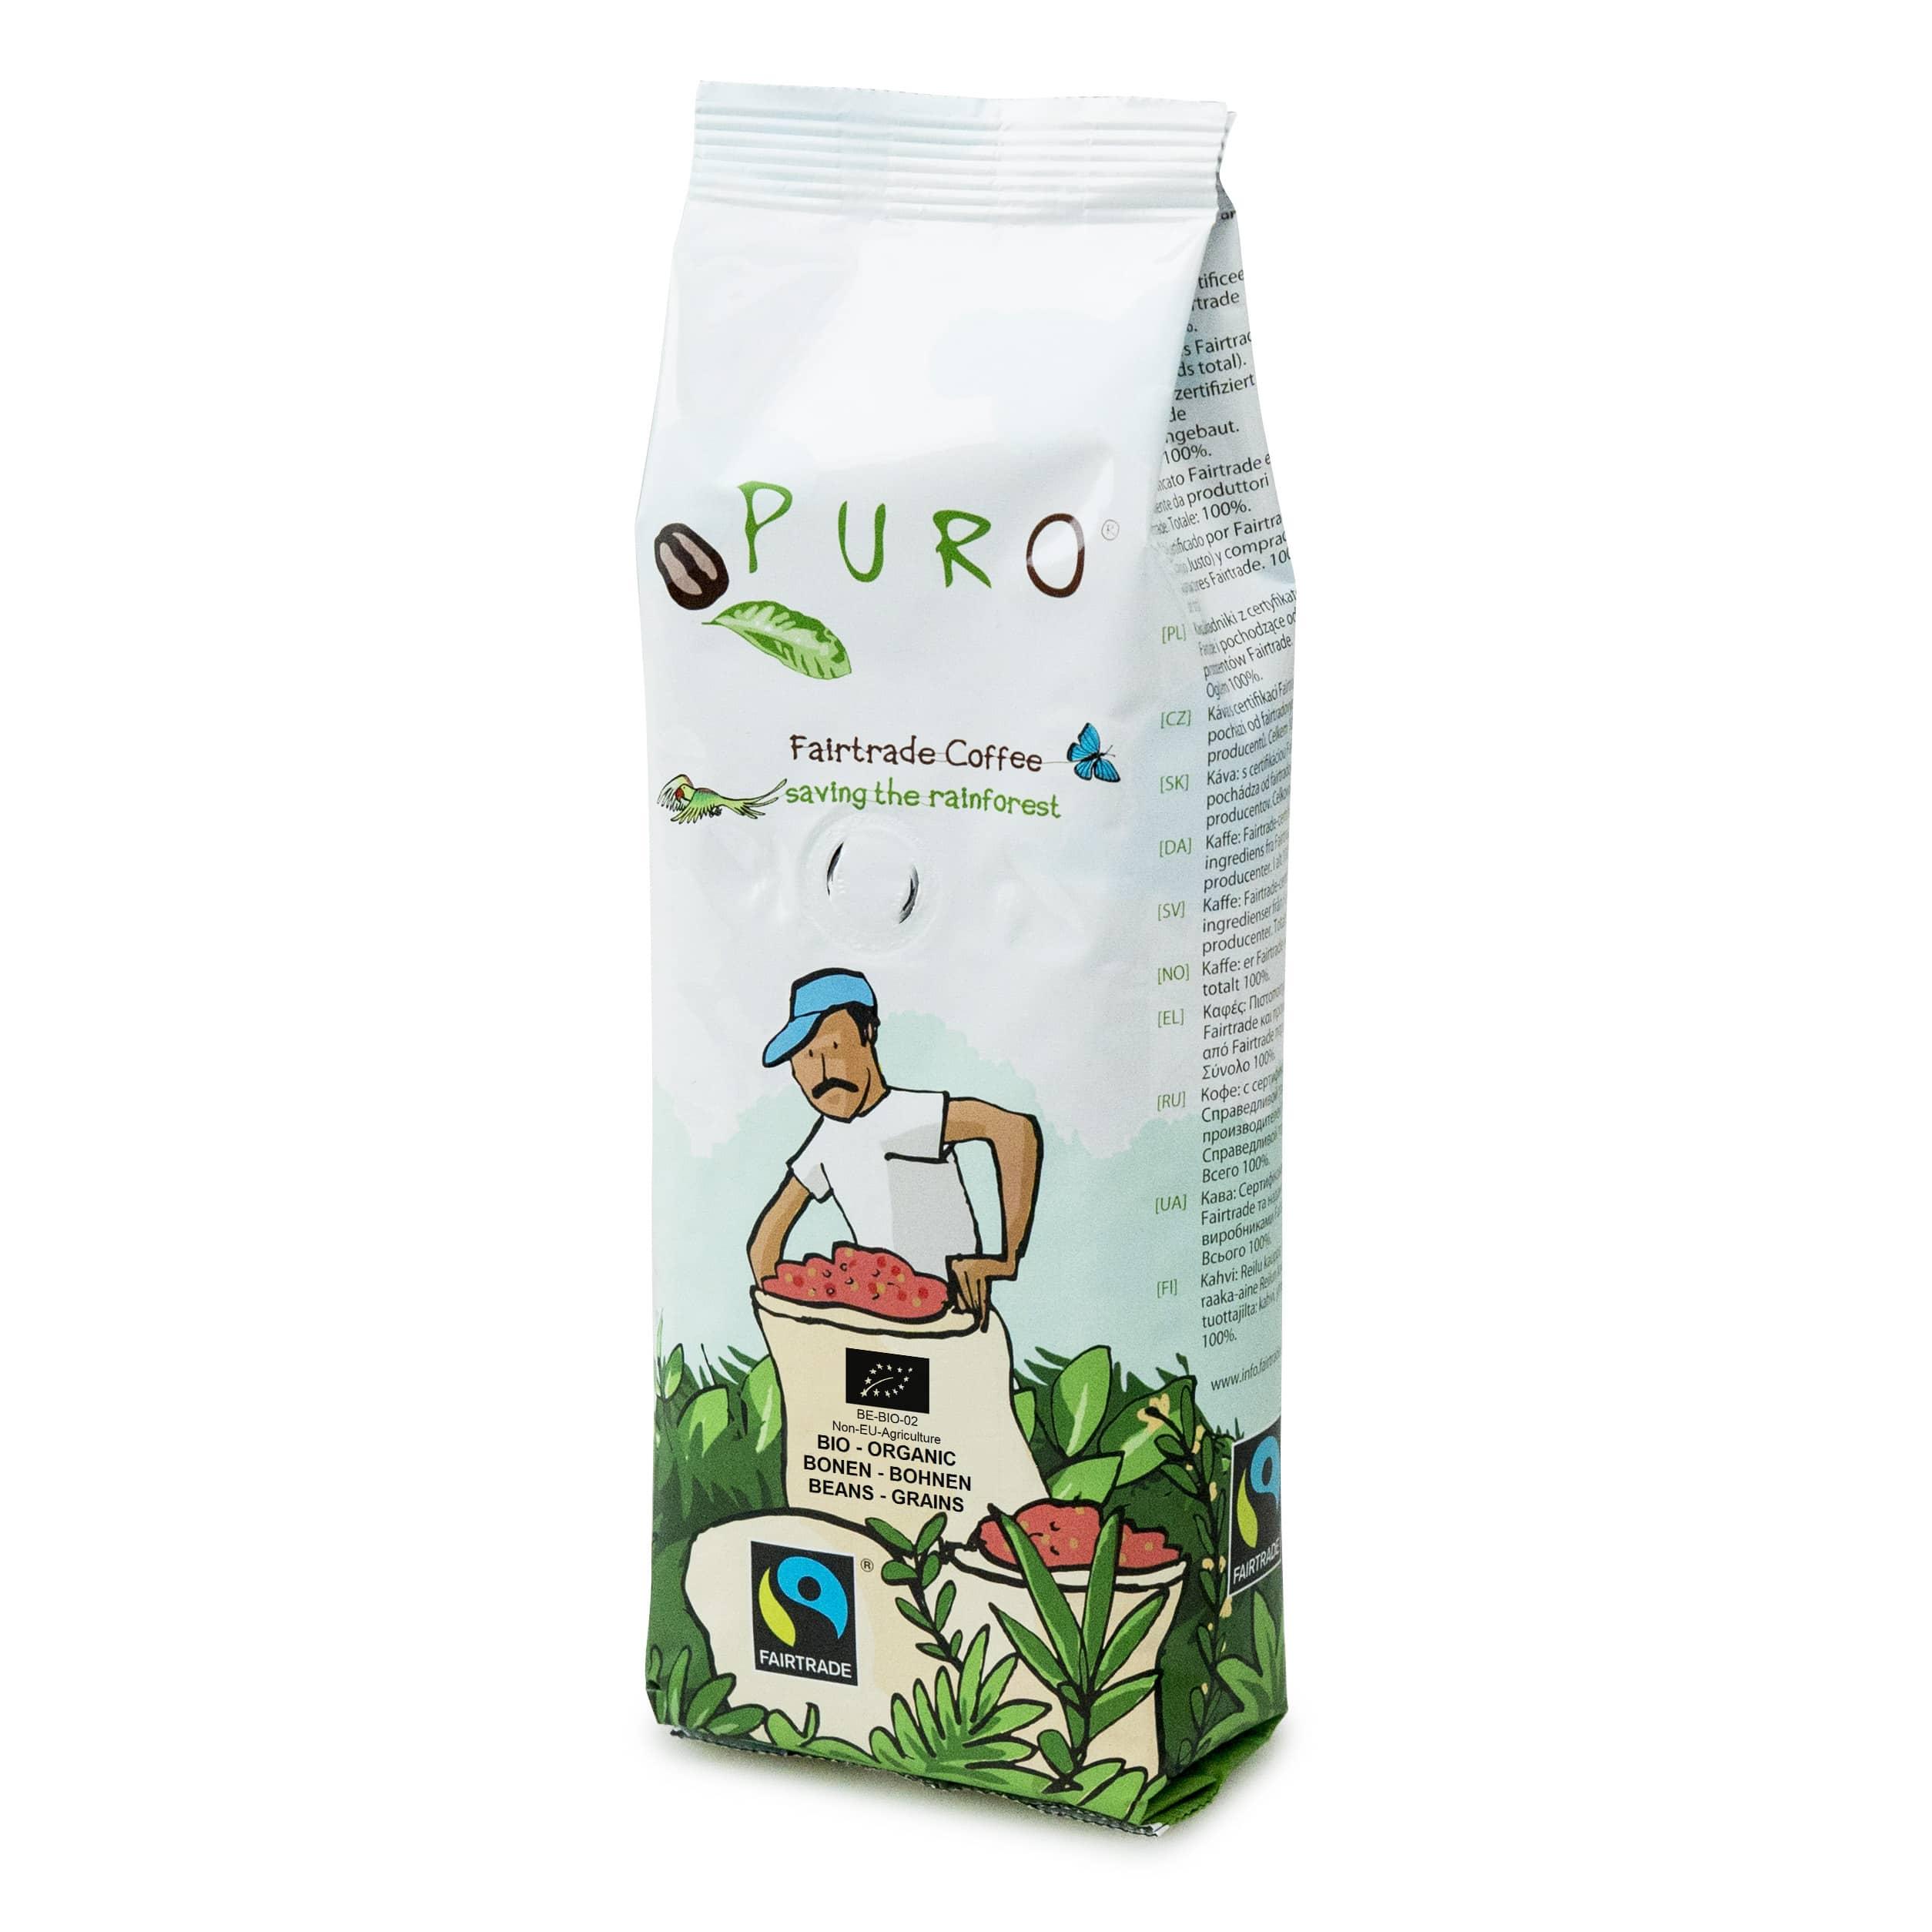 Cafea boabe, Puro, cafea bio, Arabica, Cafea Cluj-Napoca, cafea boabe Cluj-Napoca